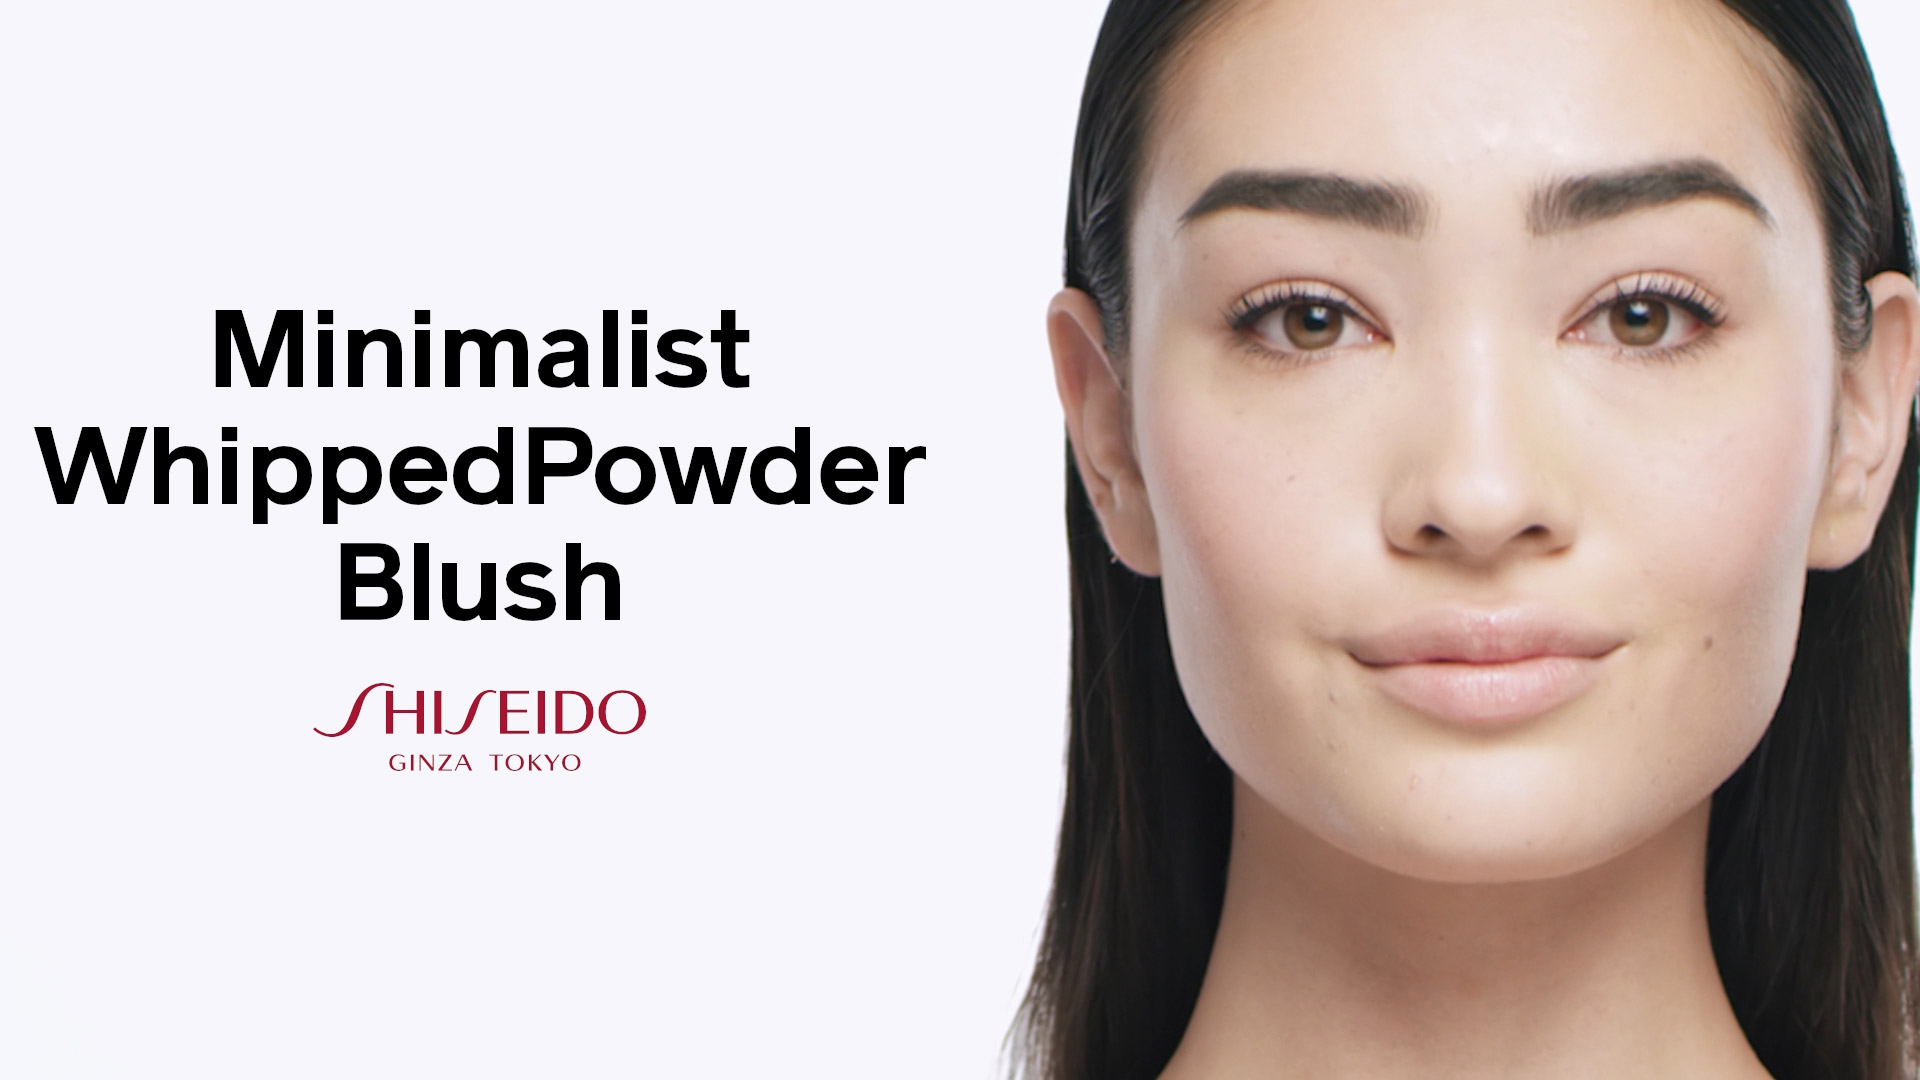 Minimalist WhippedPowder Cream Blush | SHISEIDO